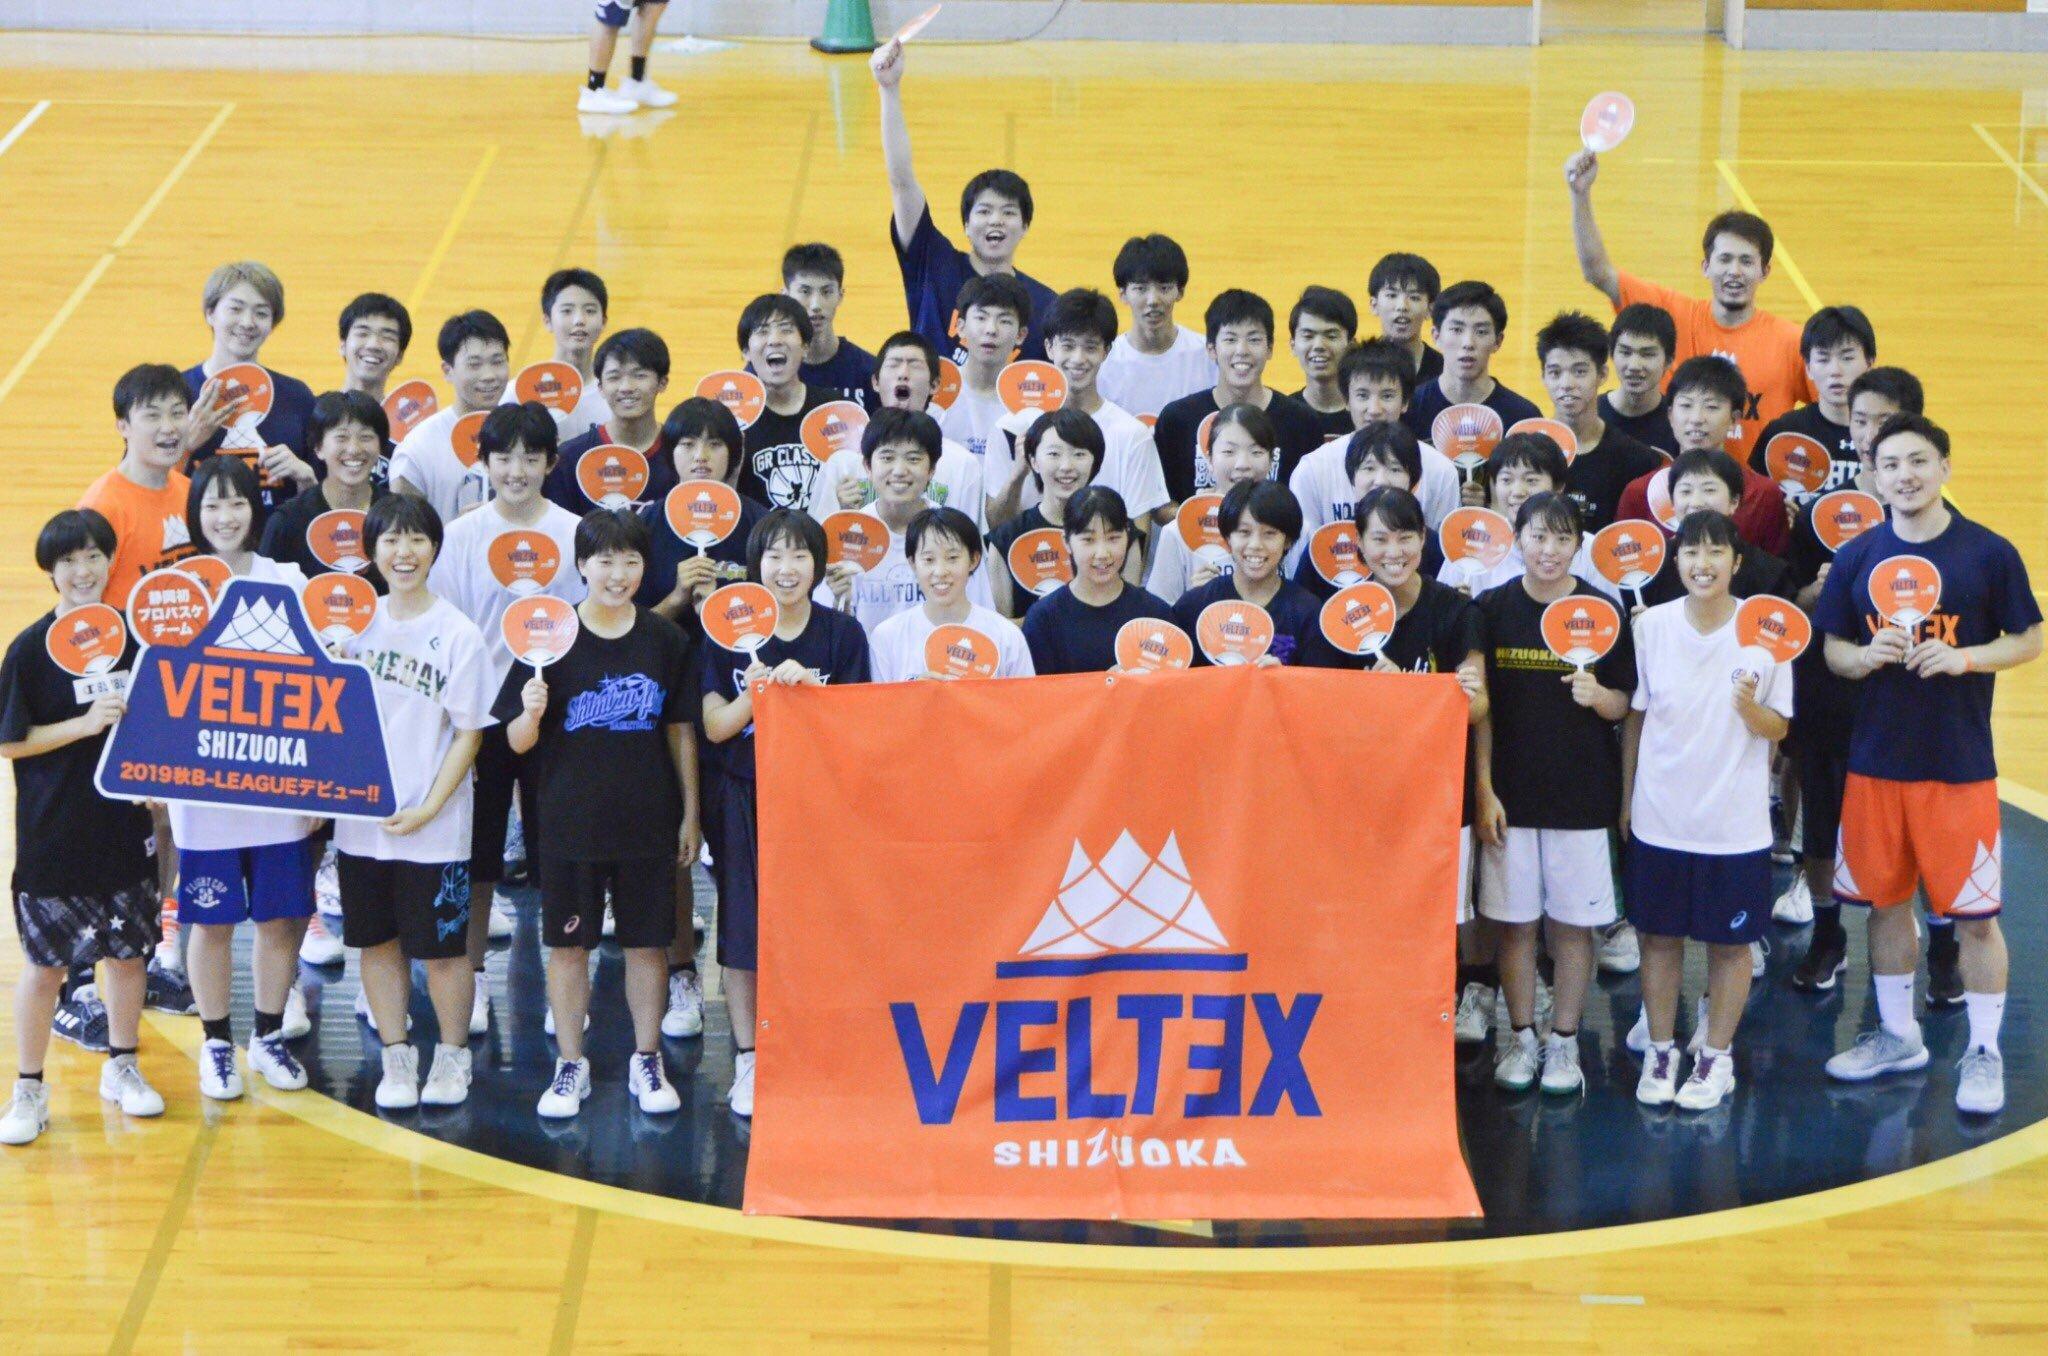 体育館 静岡 中央